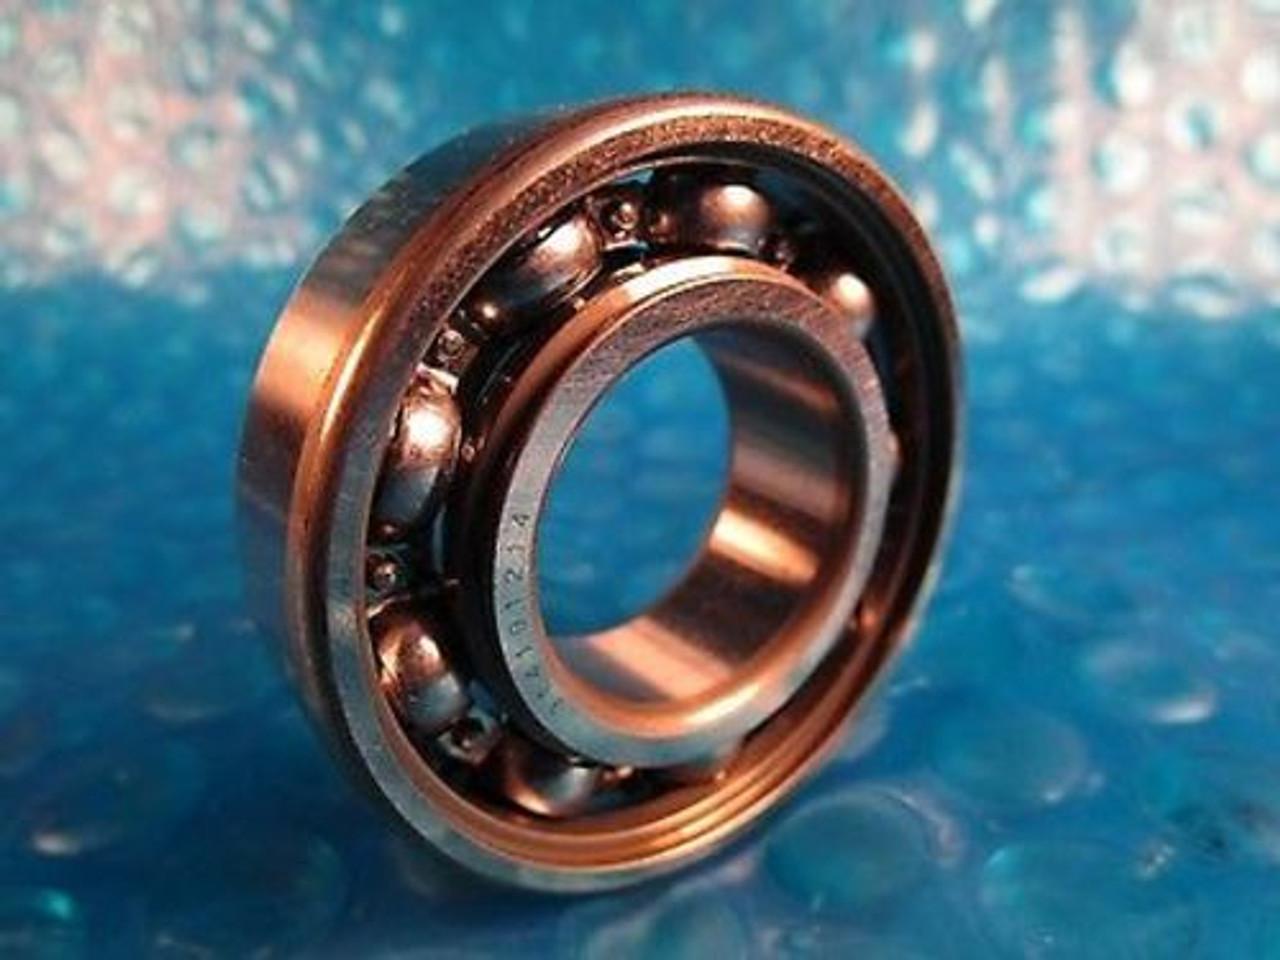 NTN 6205 U,Single Row Radial Bearing, USA made (=2 NTN, FAG , NSK, Fafnir 205K)